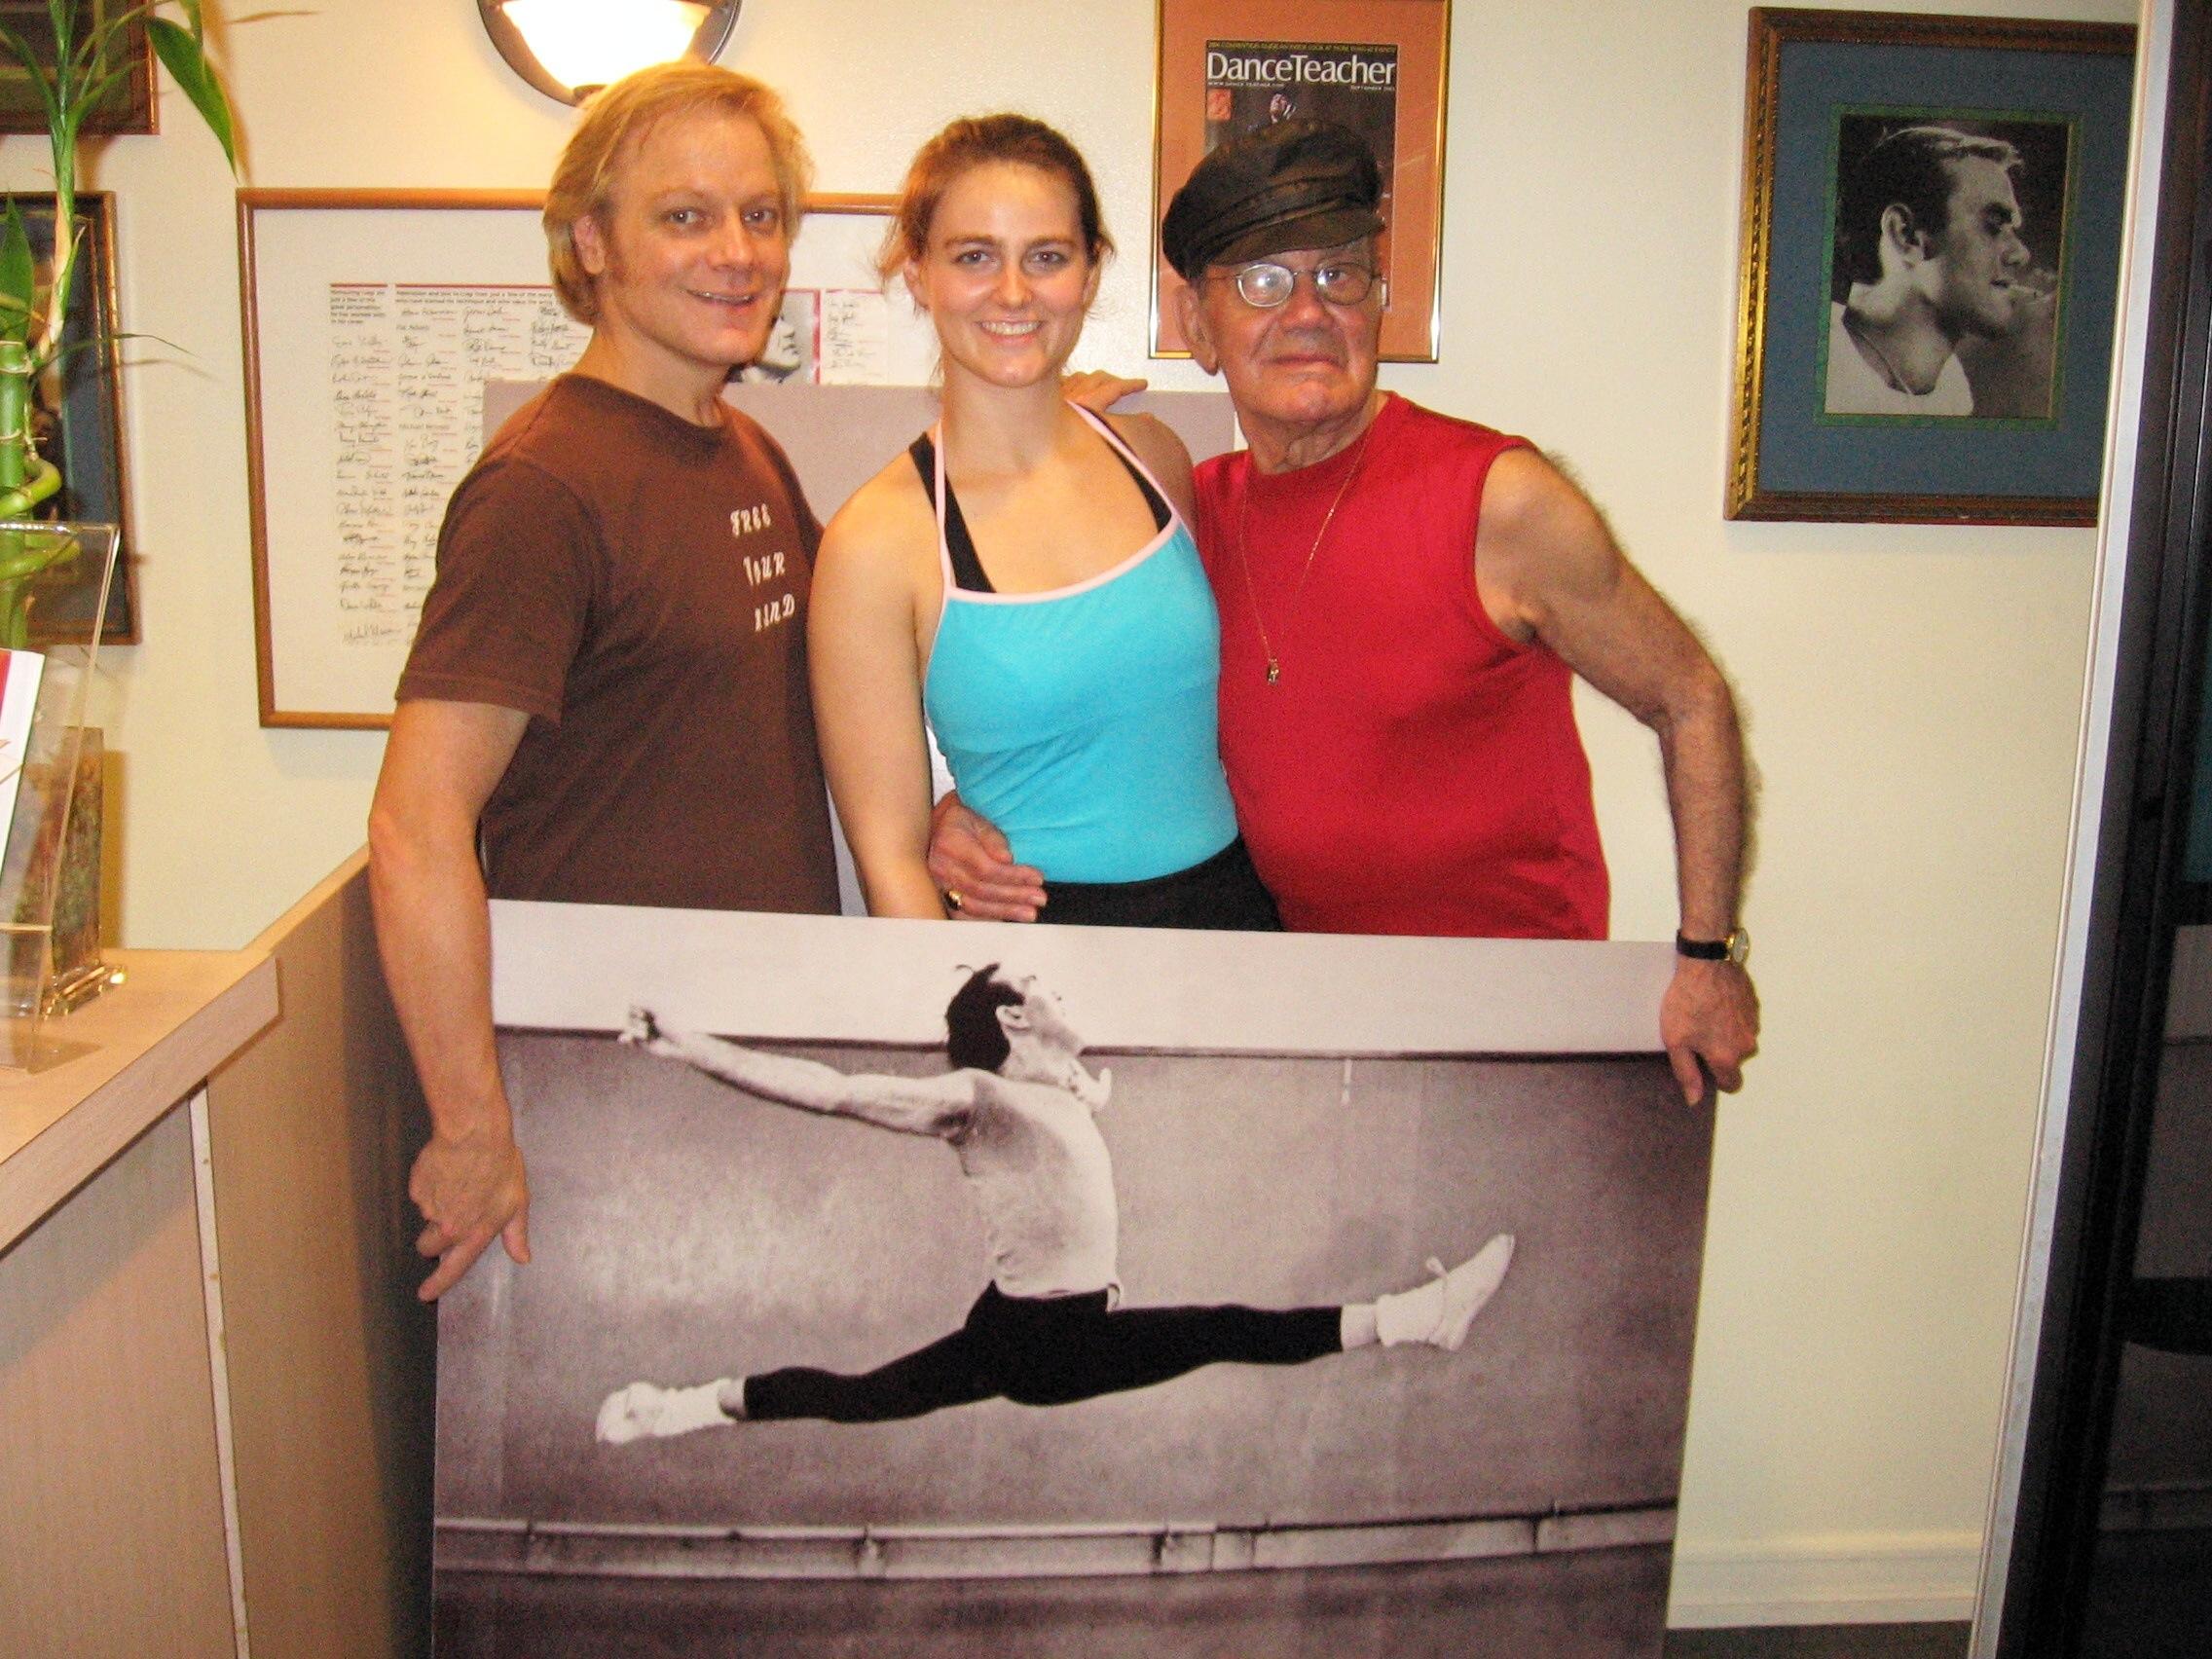 Left to Right: Francis J. Roach, Jen Westphal and Luigi @ Luigi Jazz Centre, NYC 2006